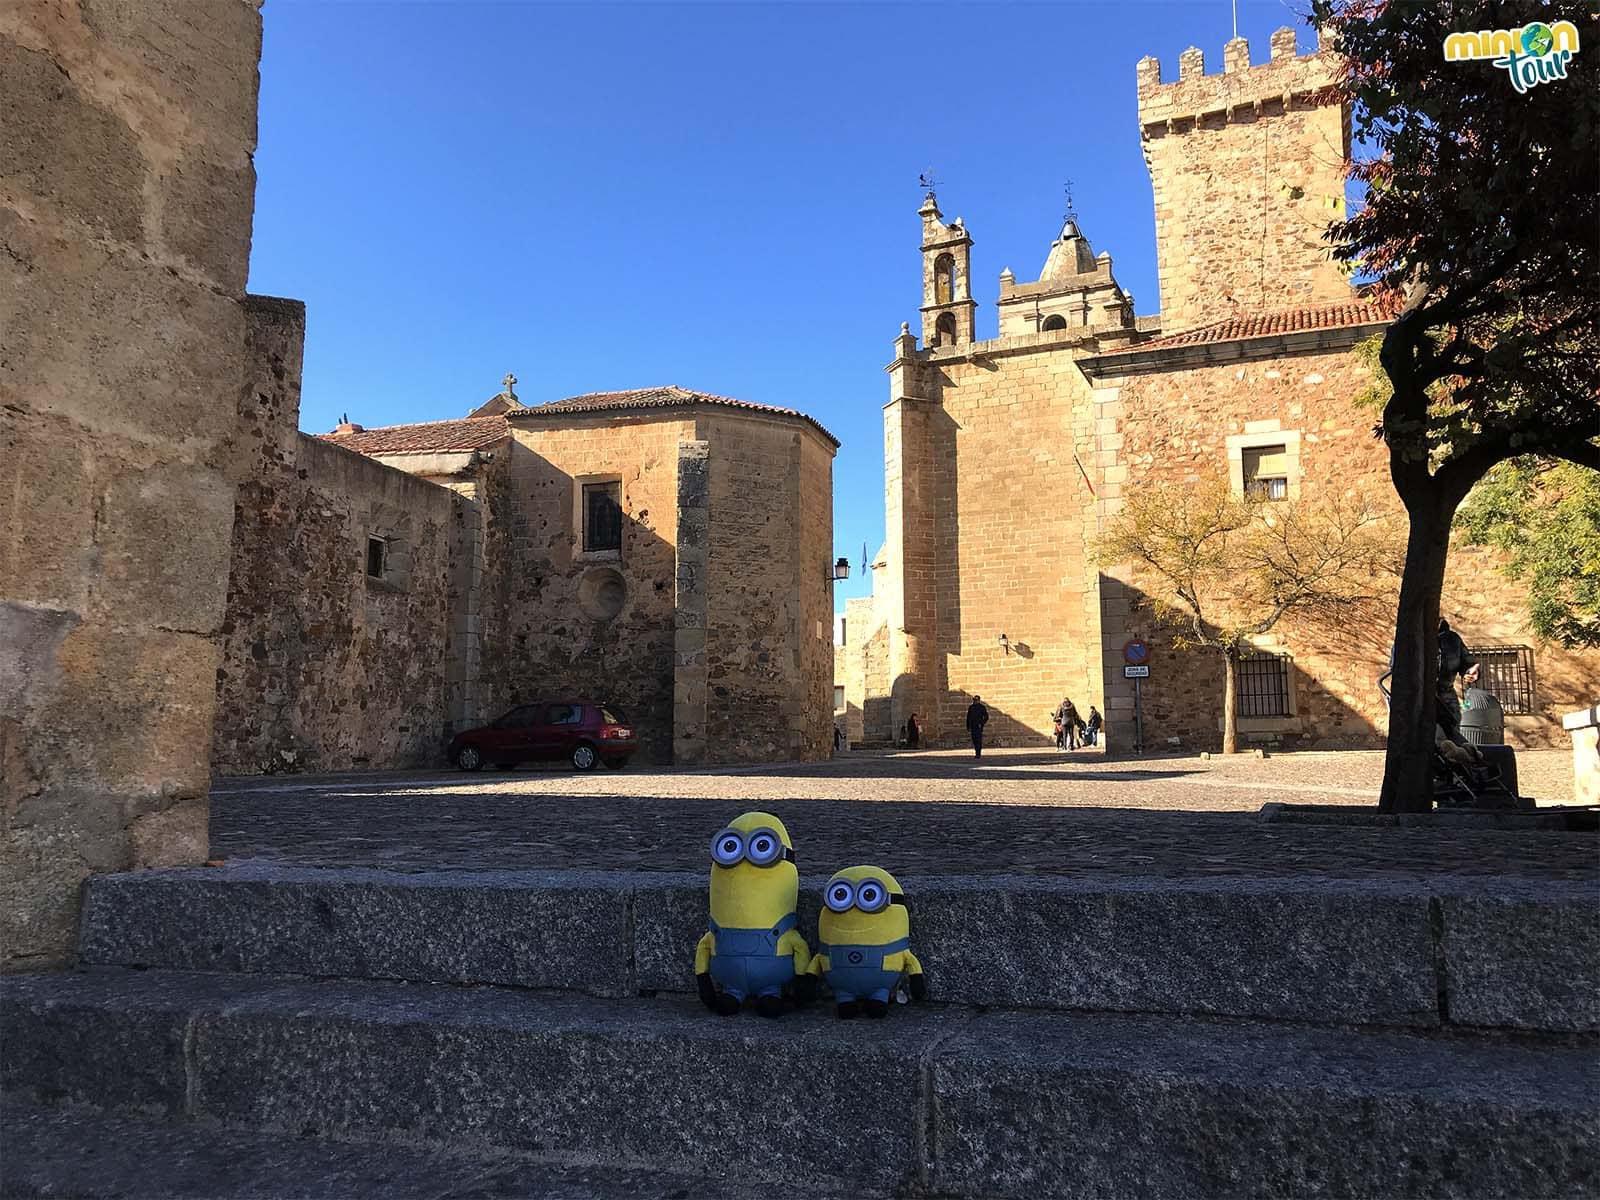 Paseando por las calles de Cáceres